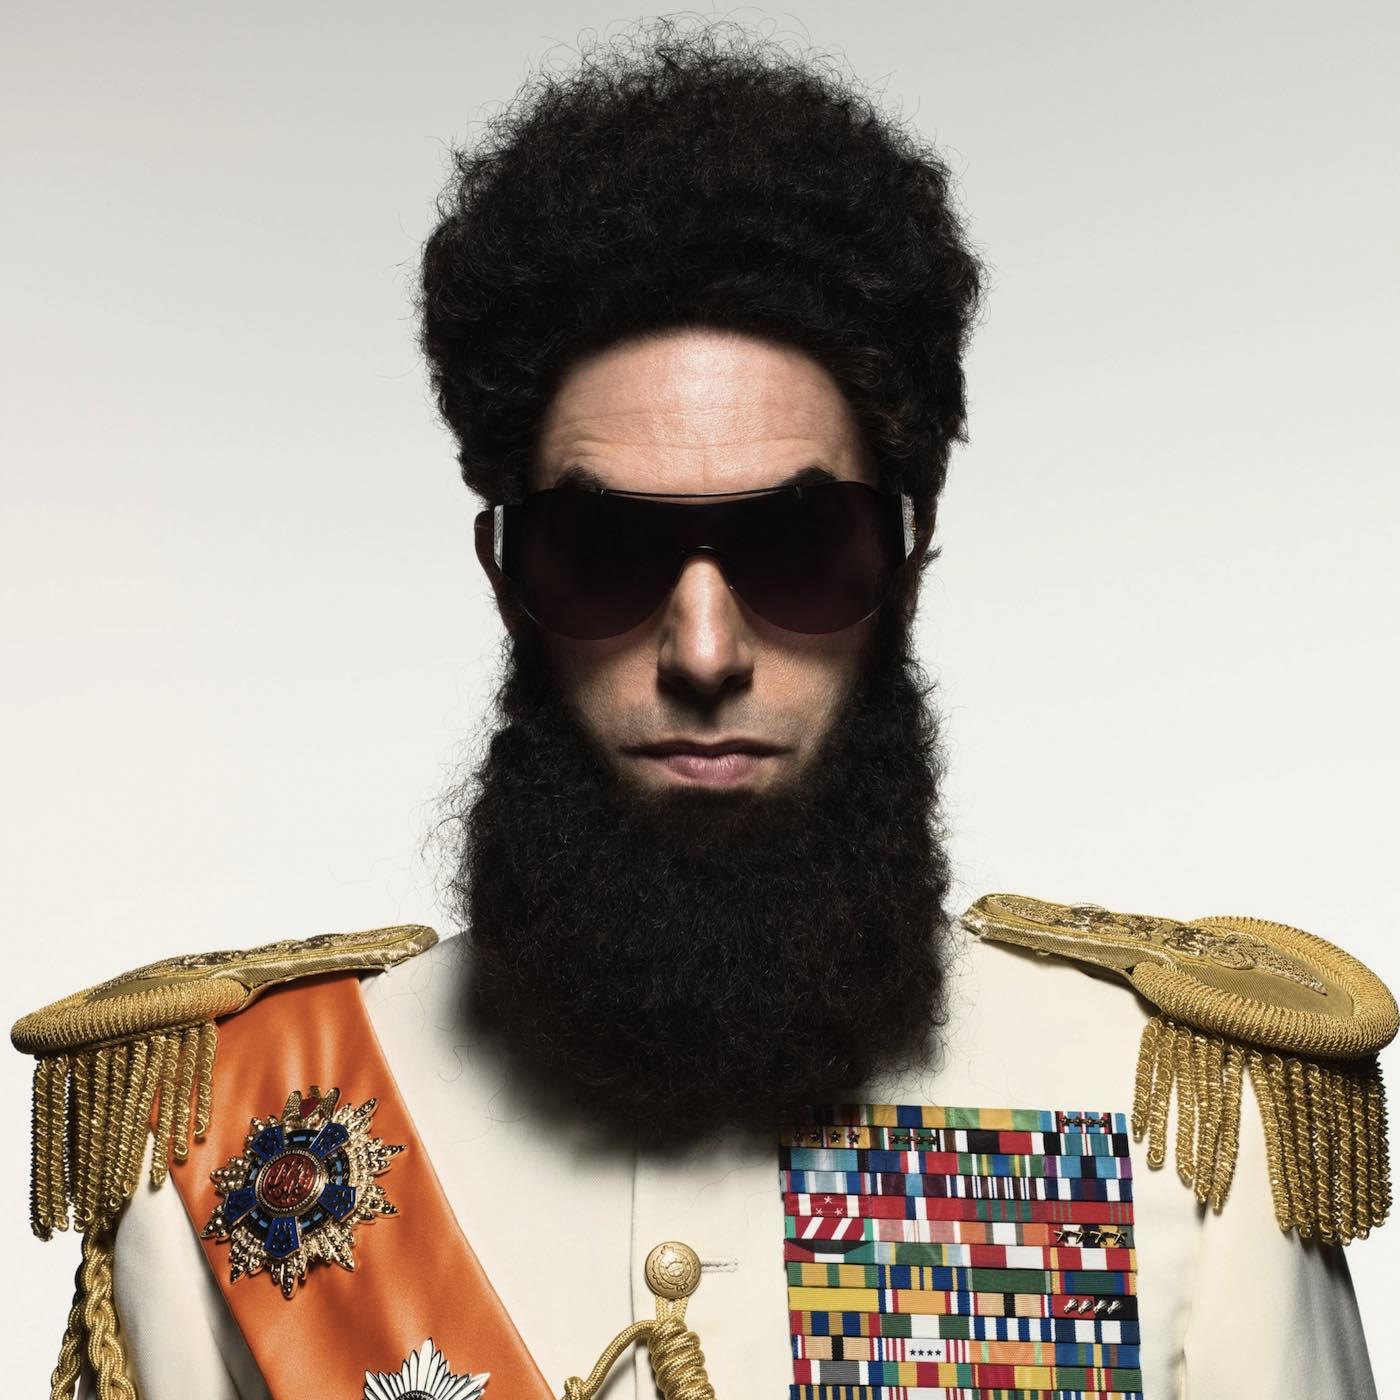 The Four Week Beard Rule